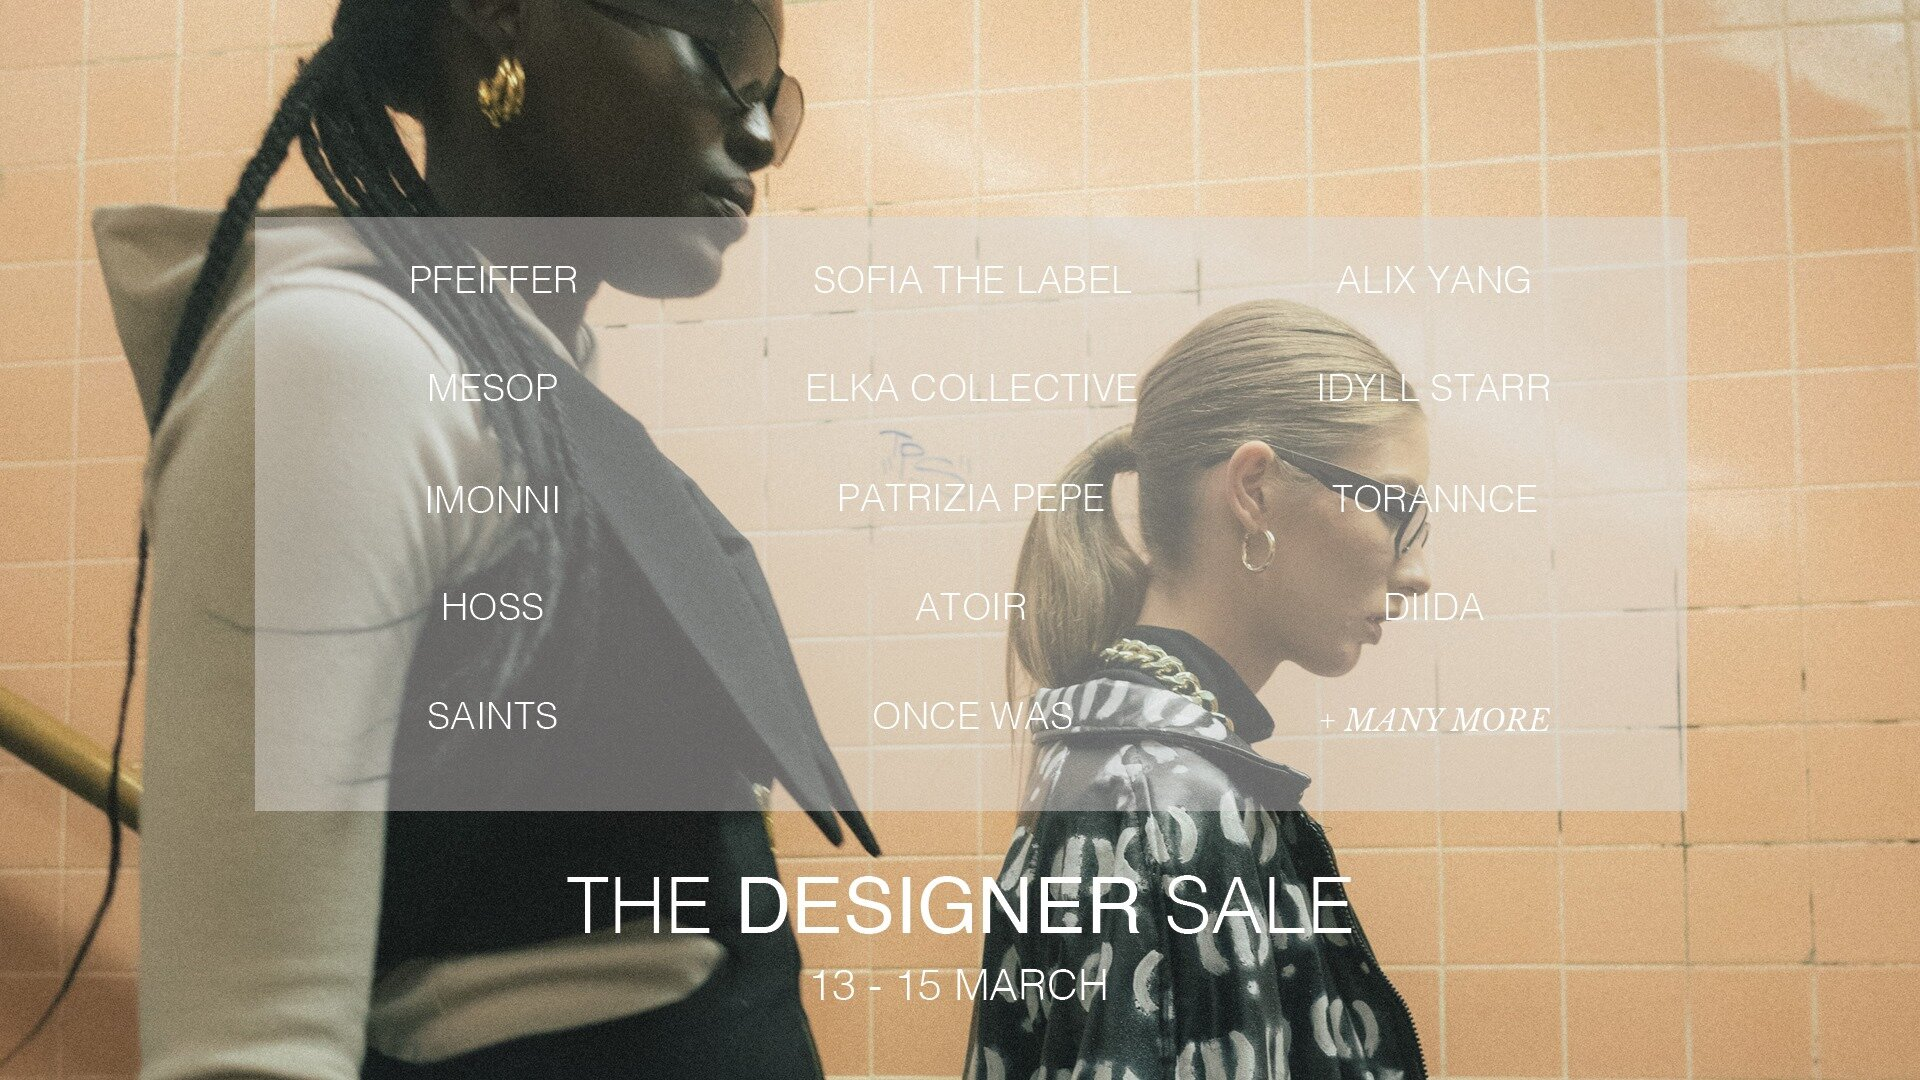 The Designer Sale Australian Fashion Event Home